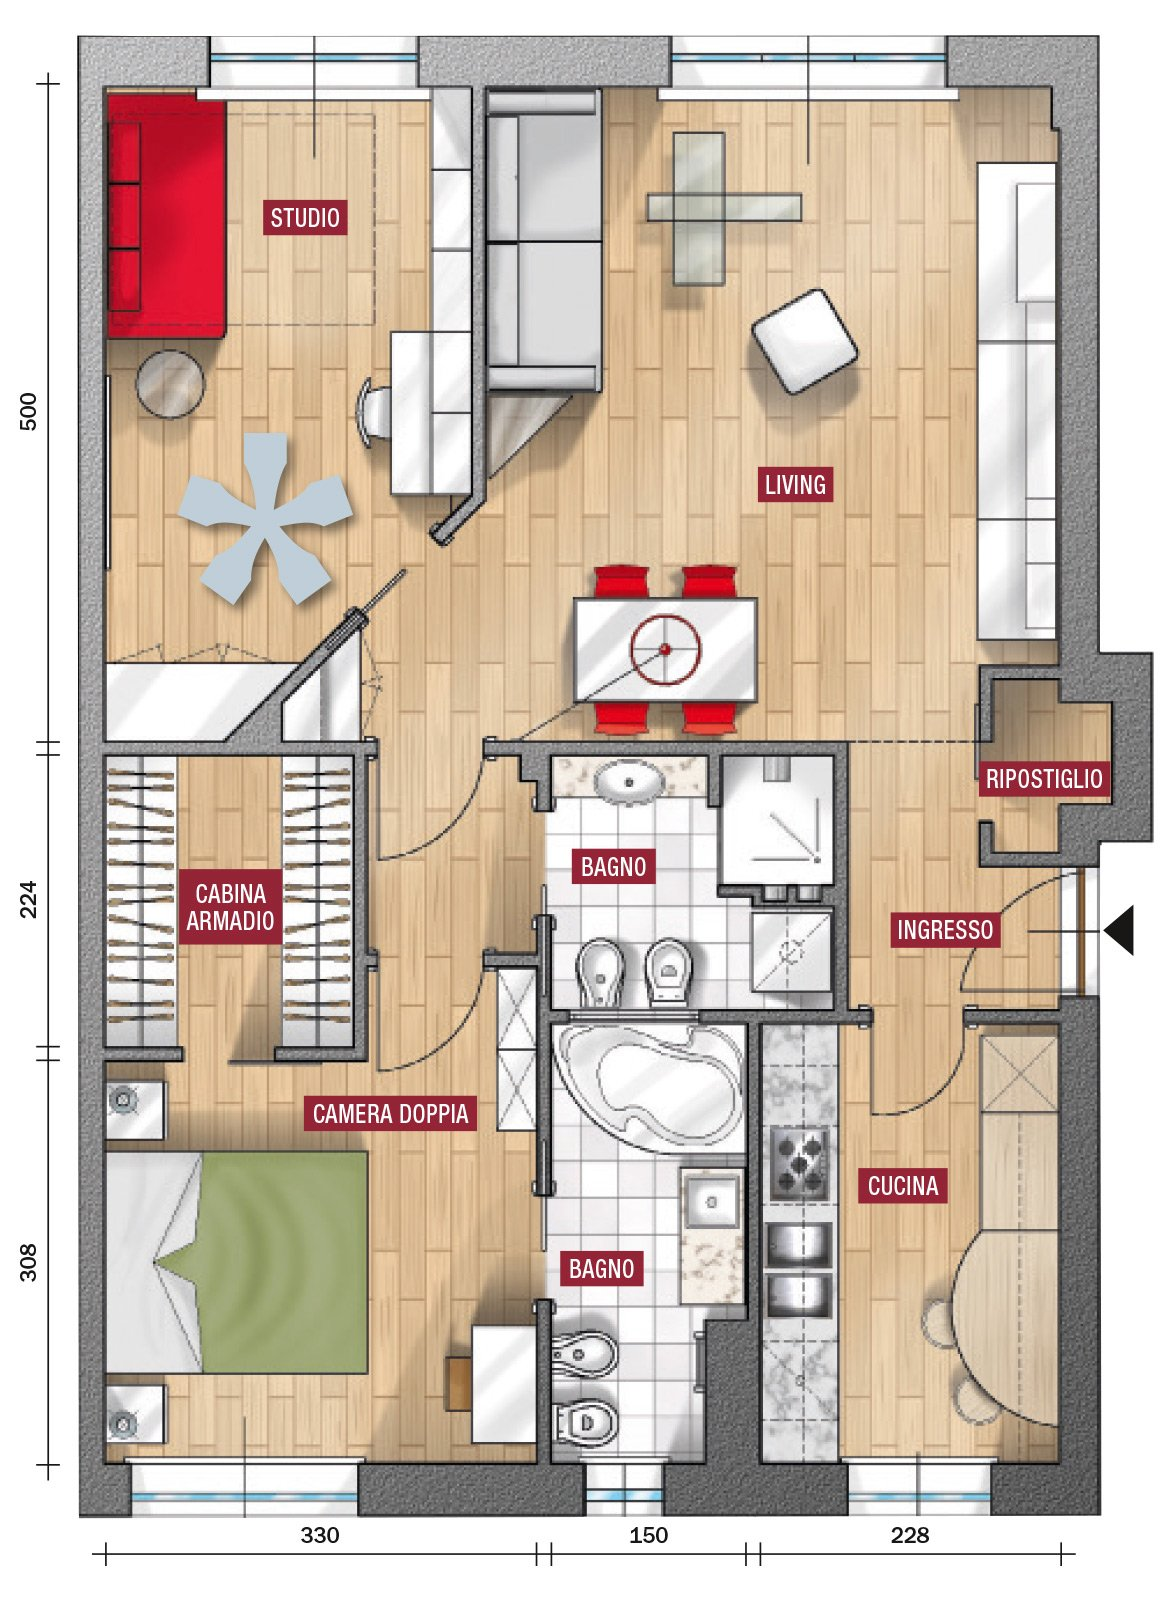 Planimetria casa 80 mq es53 regardsdefemmes - Progetto casa 80 mq ...